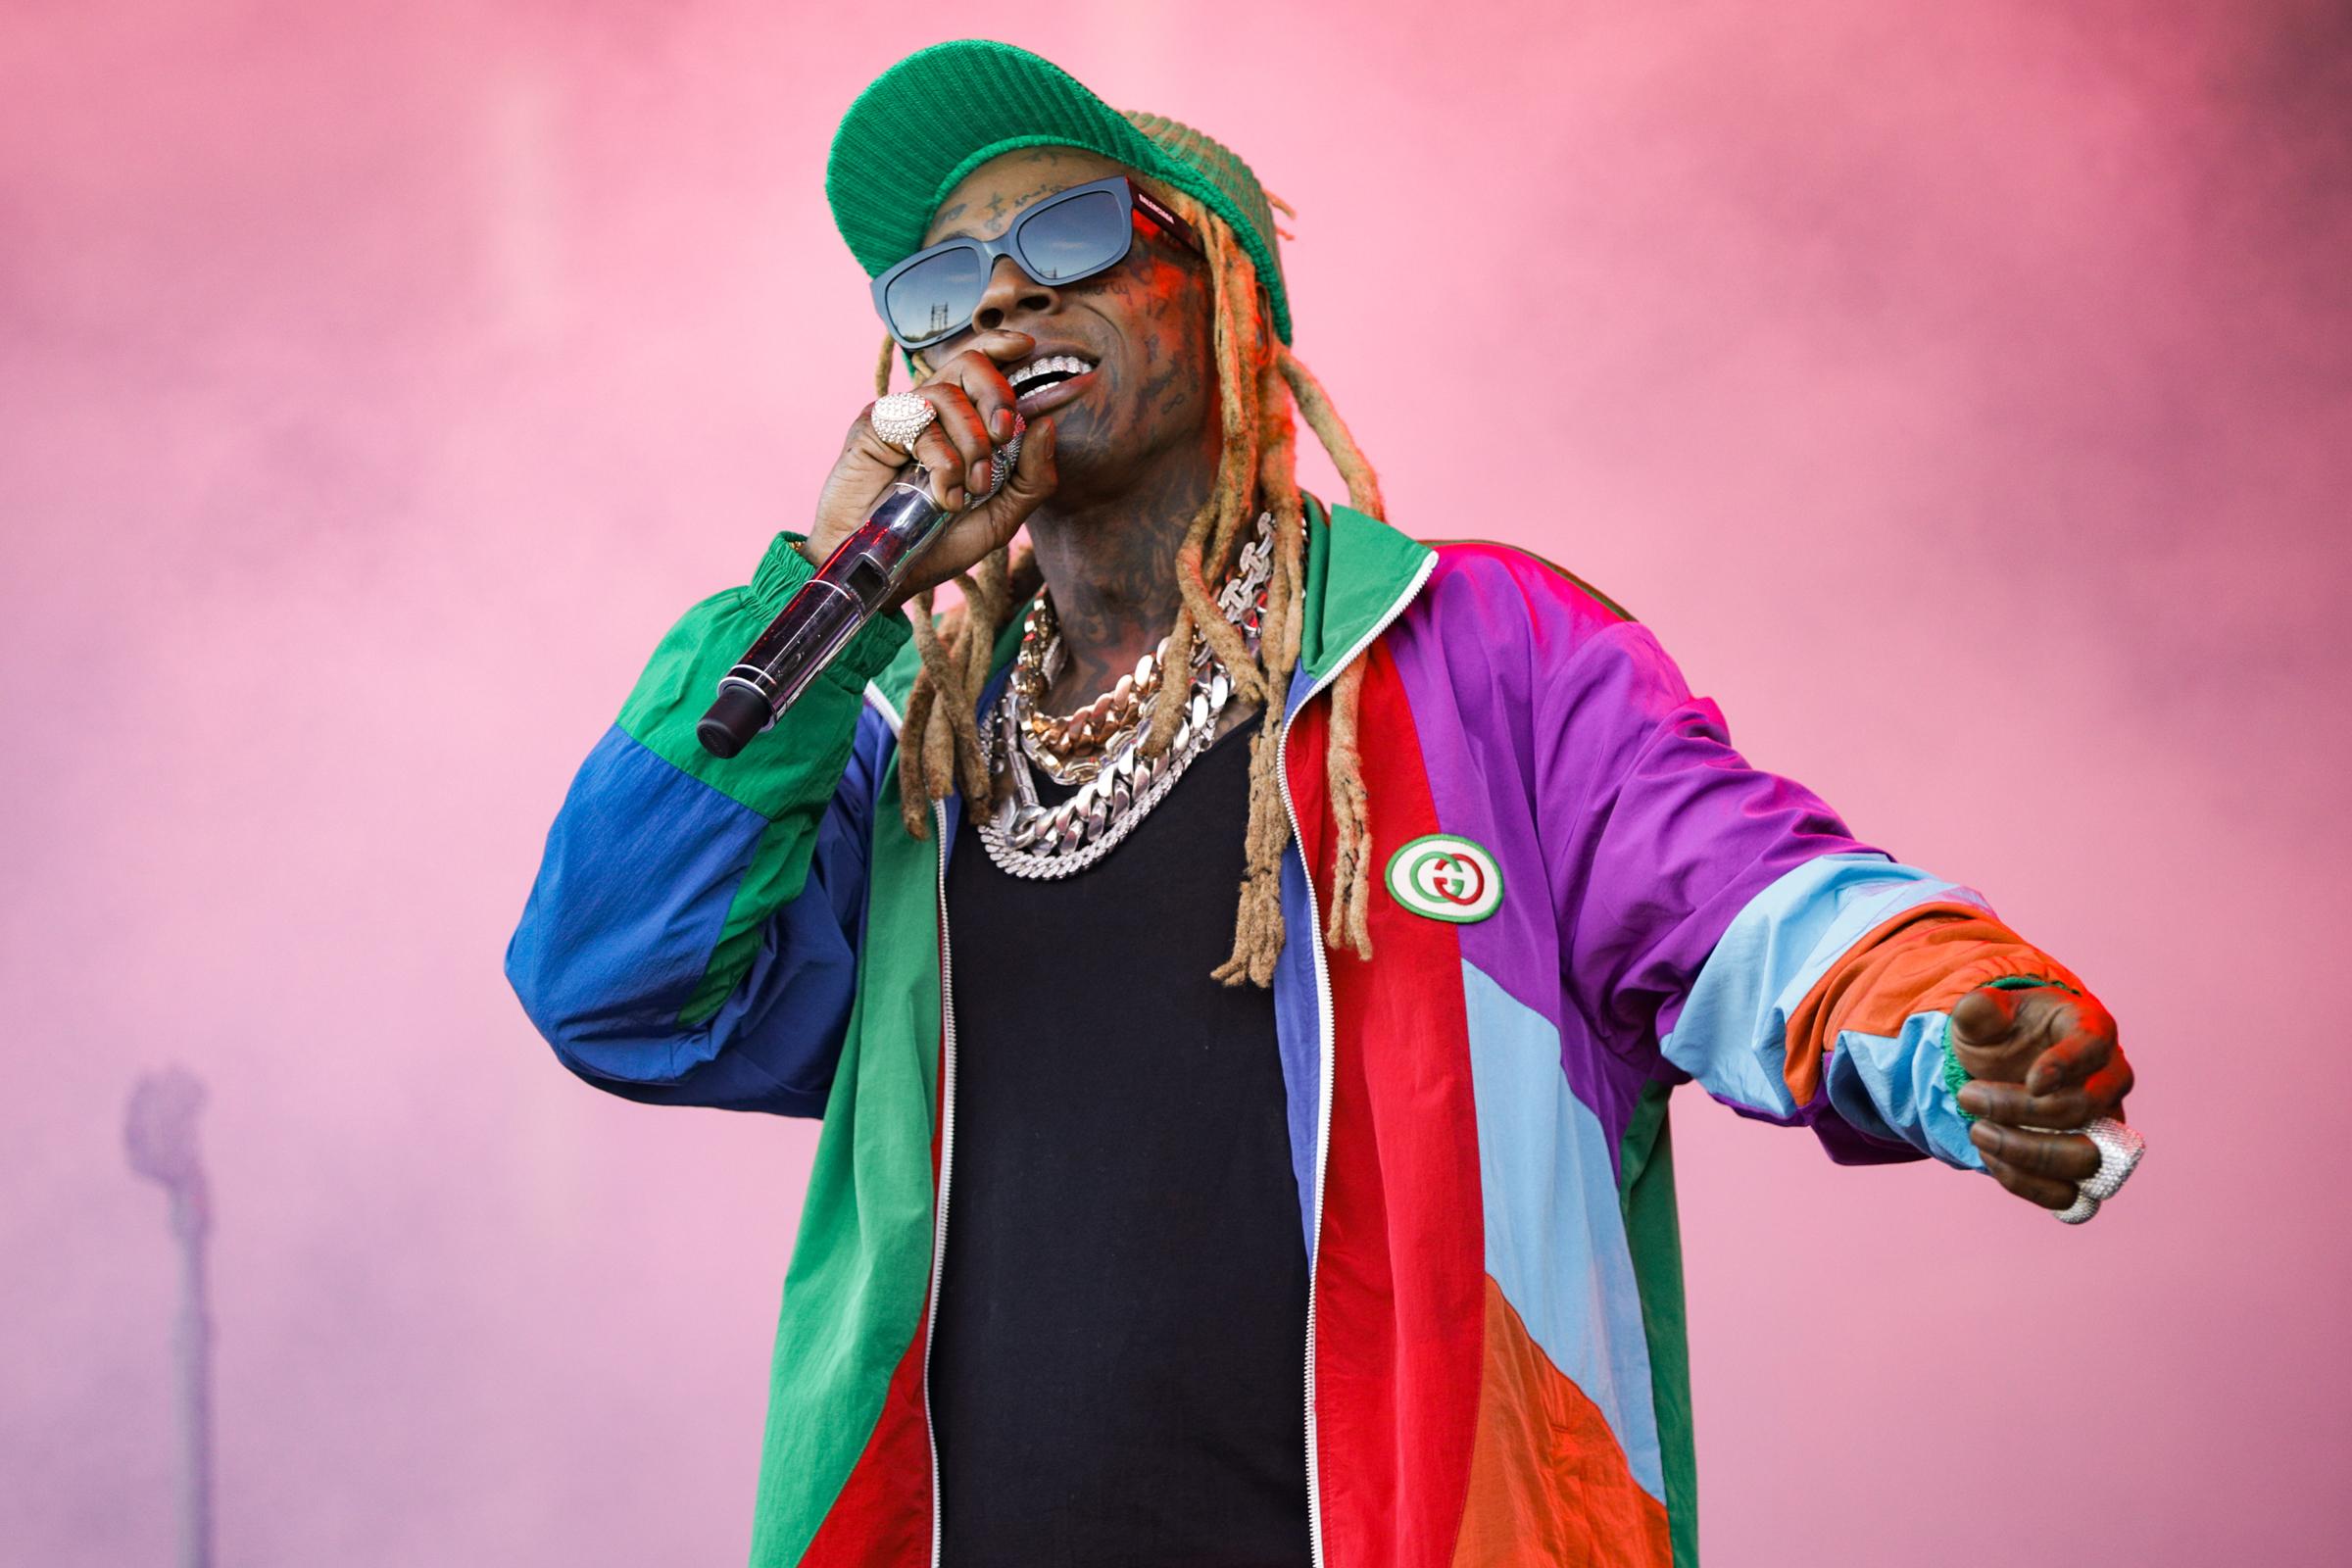 Juvenile, Birdman Tap Lil Wayne for Smooth New Song 'Ride